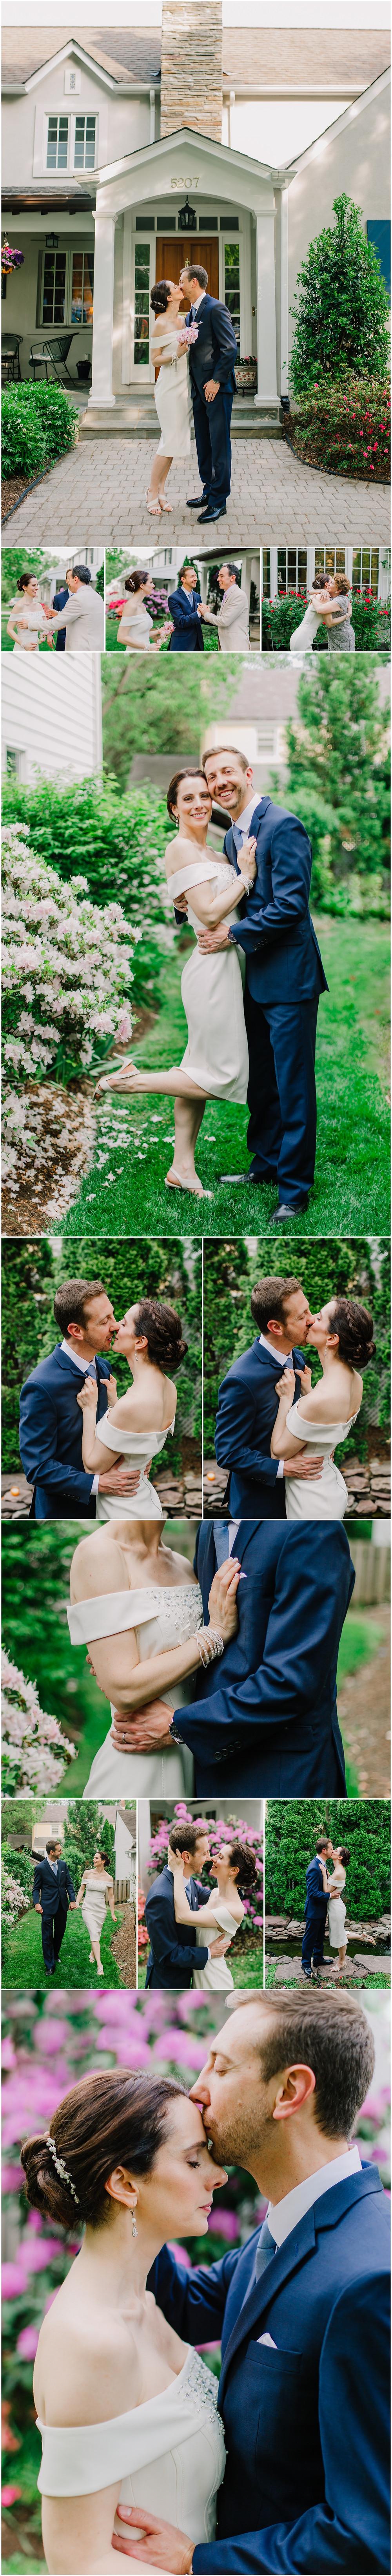 Intimate Maryland Spring Wedding Portraits - Maryland Wedding Photographer